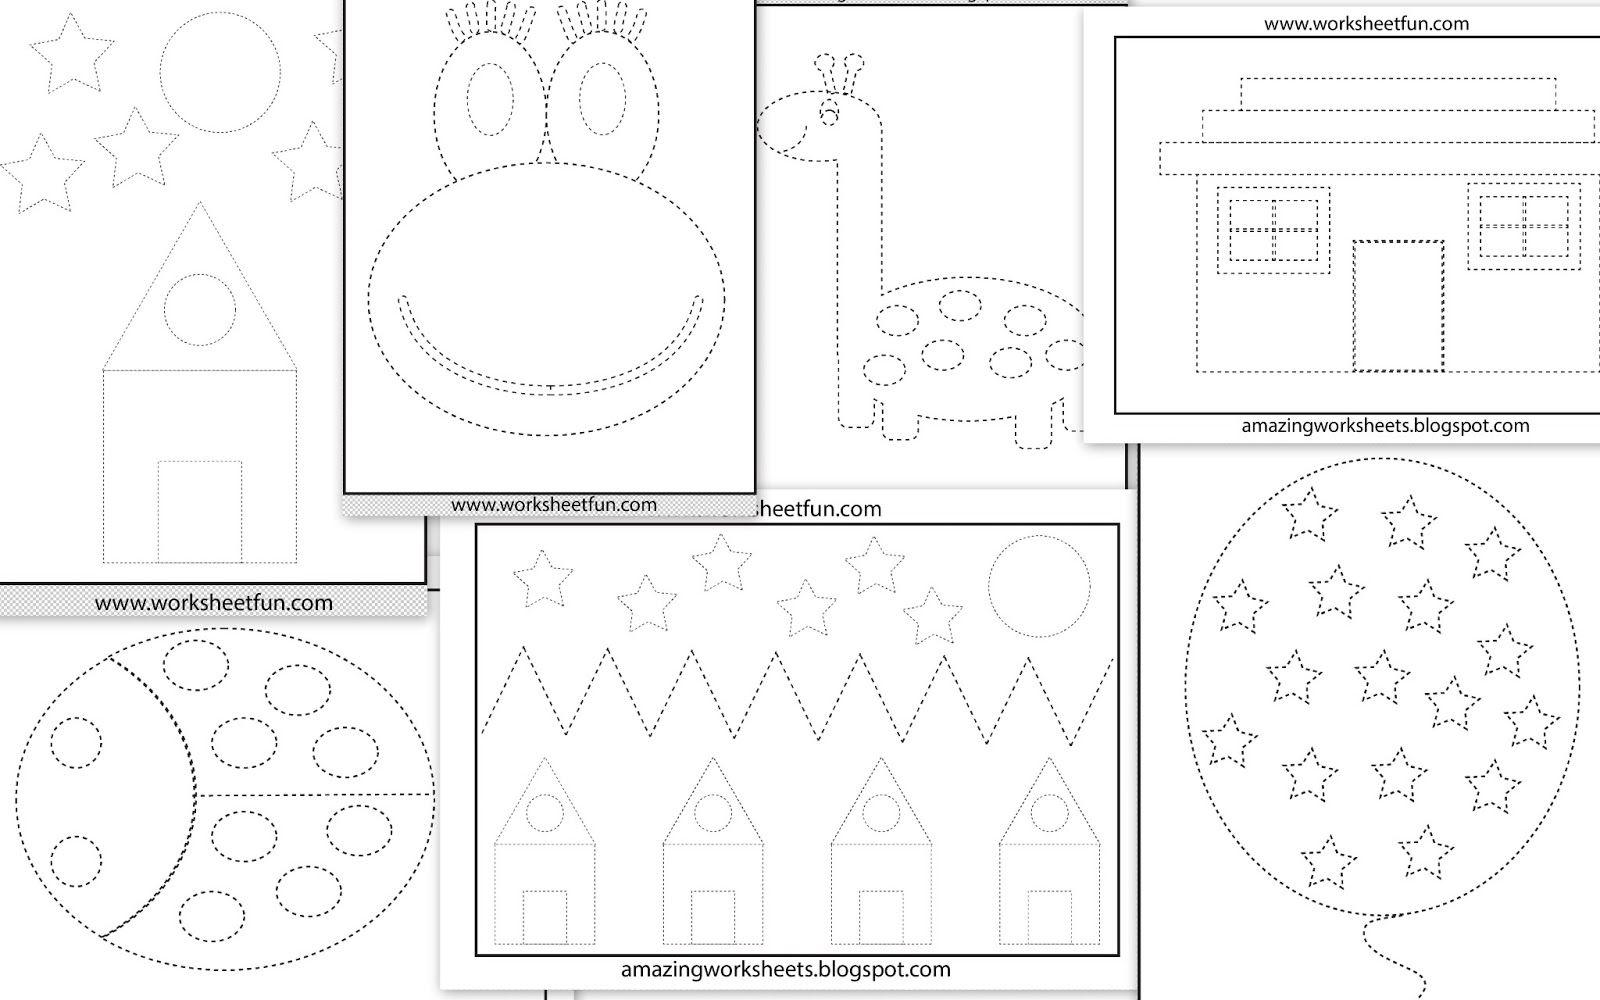 Worksheetfun Free Printable Worksheets Preschool Tracing Printable Preschool Worksheets Preschool Worksheets [ 1000 x 1600 Pixel ]